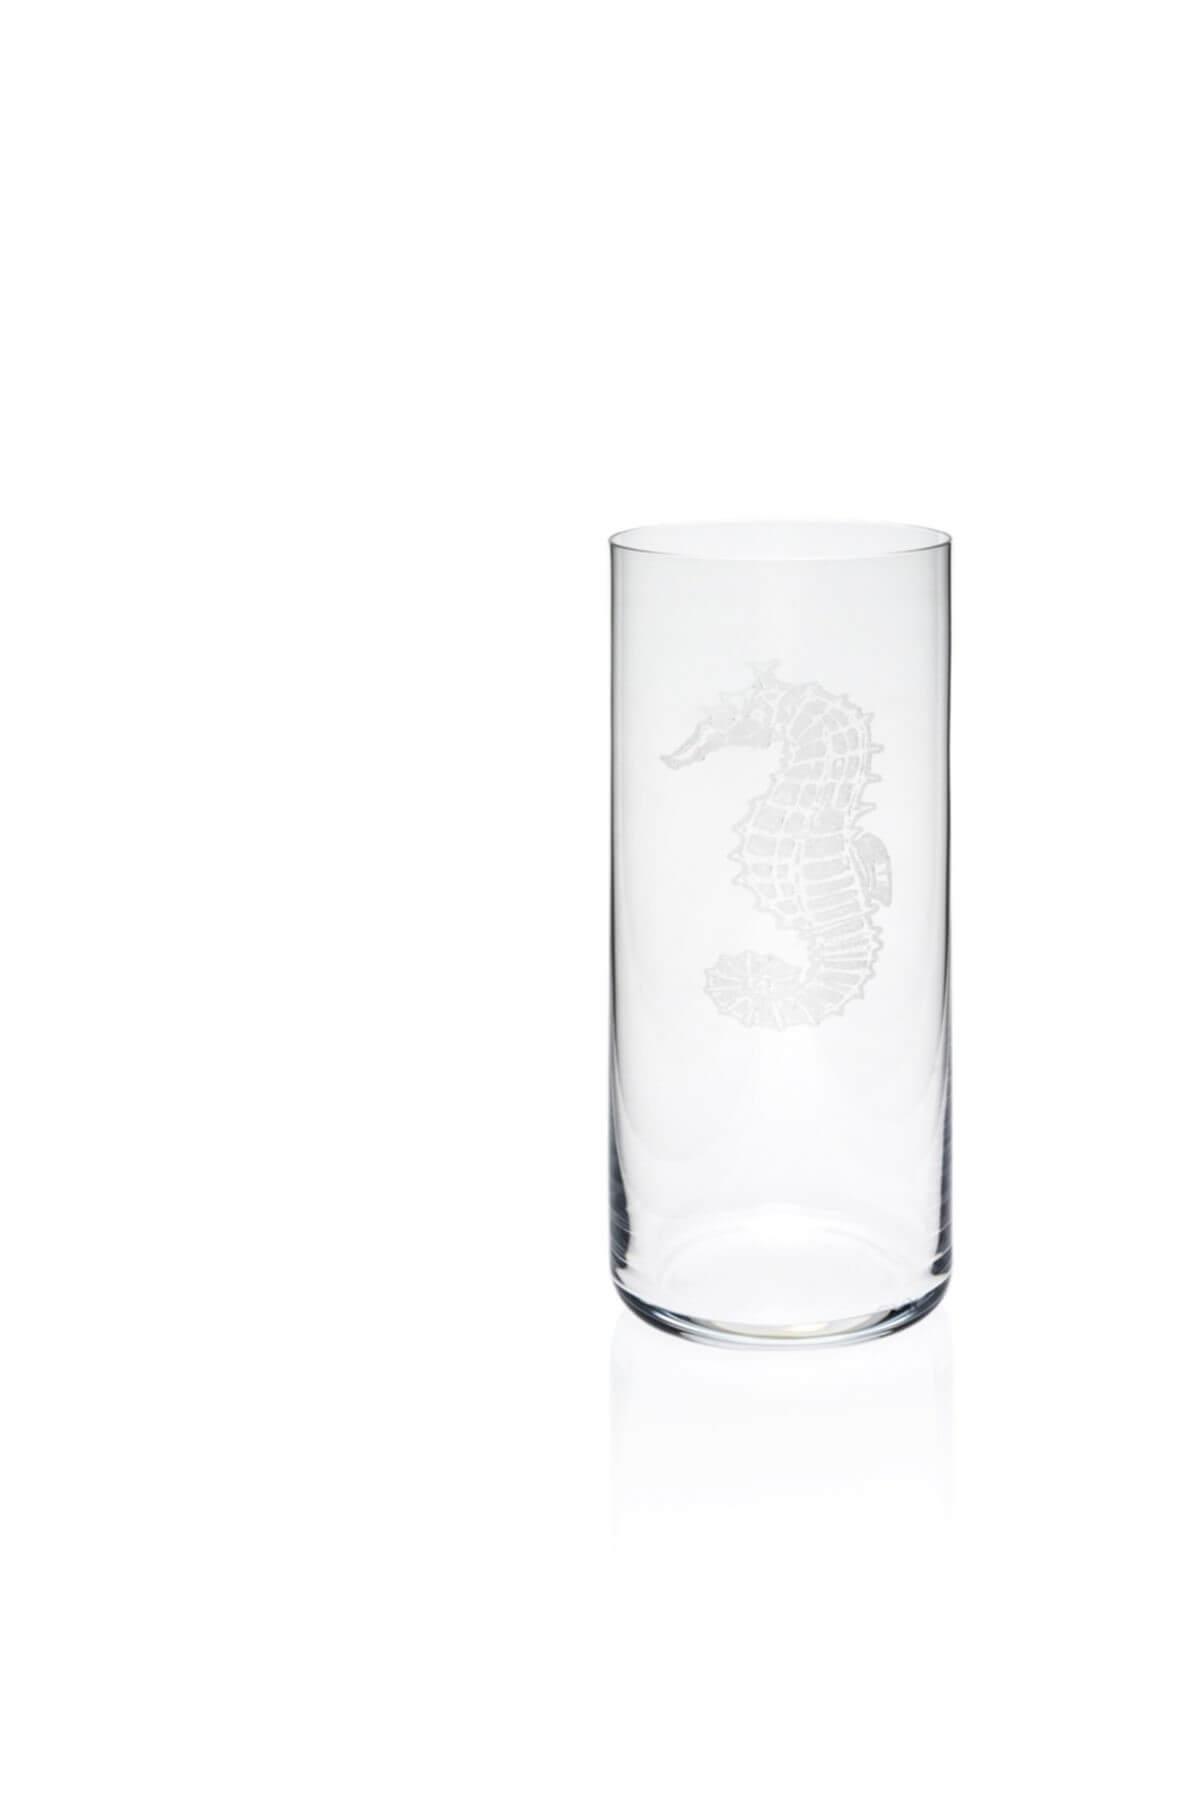 ZM Decor Meşrubat Bardağı 4'lü Set 2